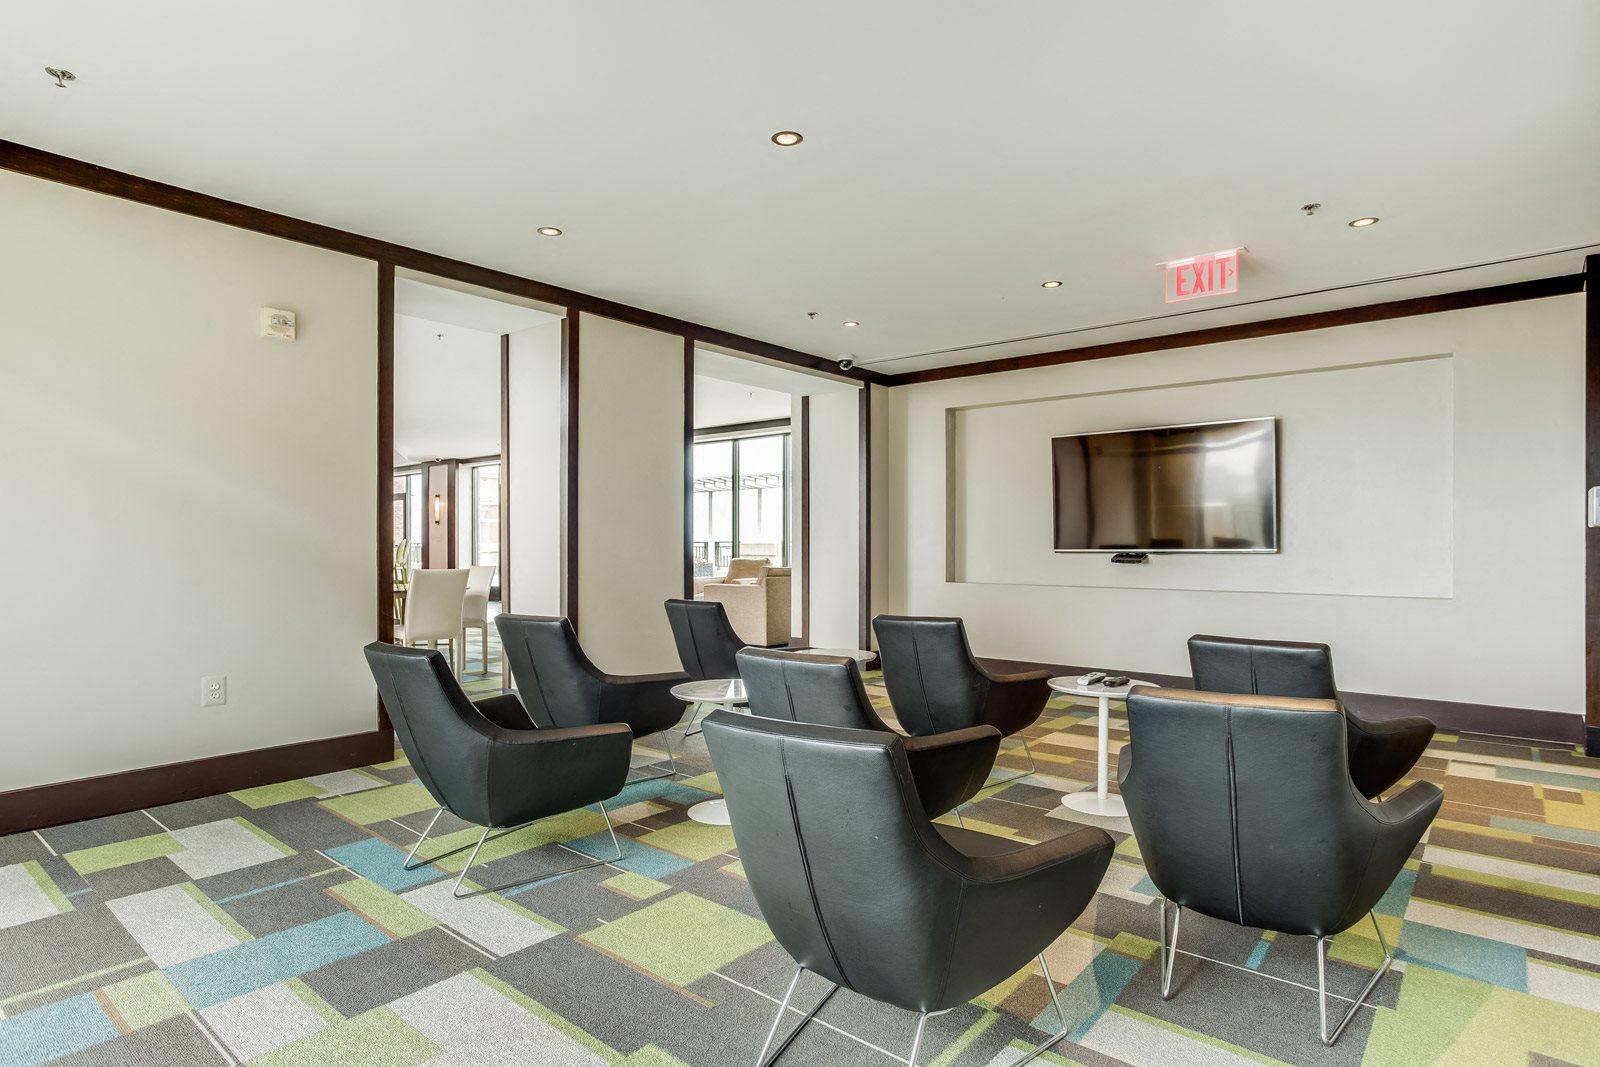 Media Room at Halstead Tower by Windsor, 4380 King Street, VA